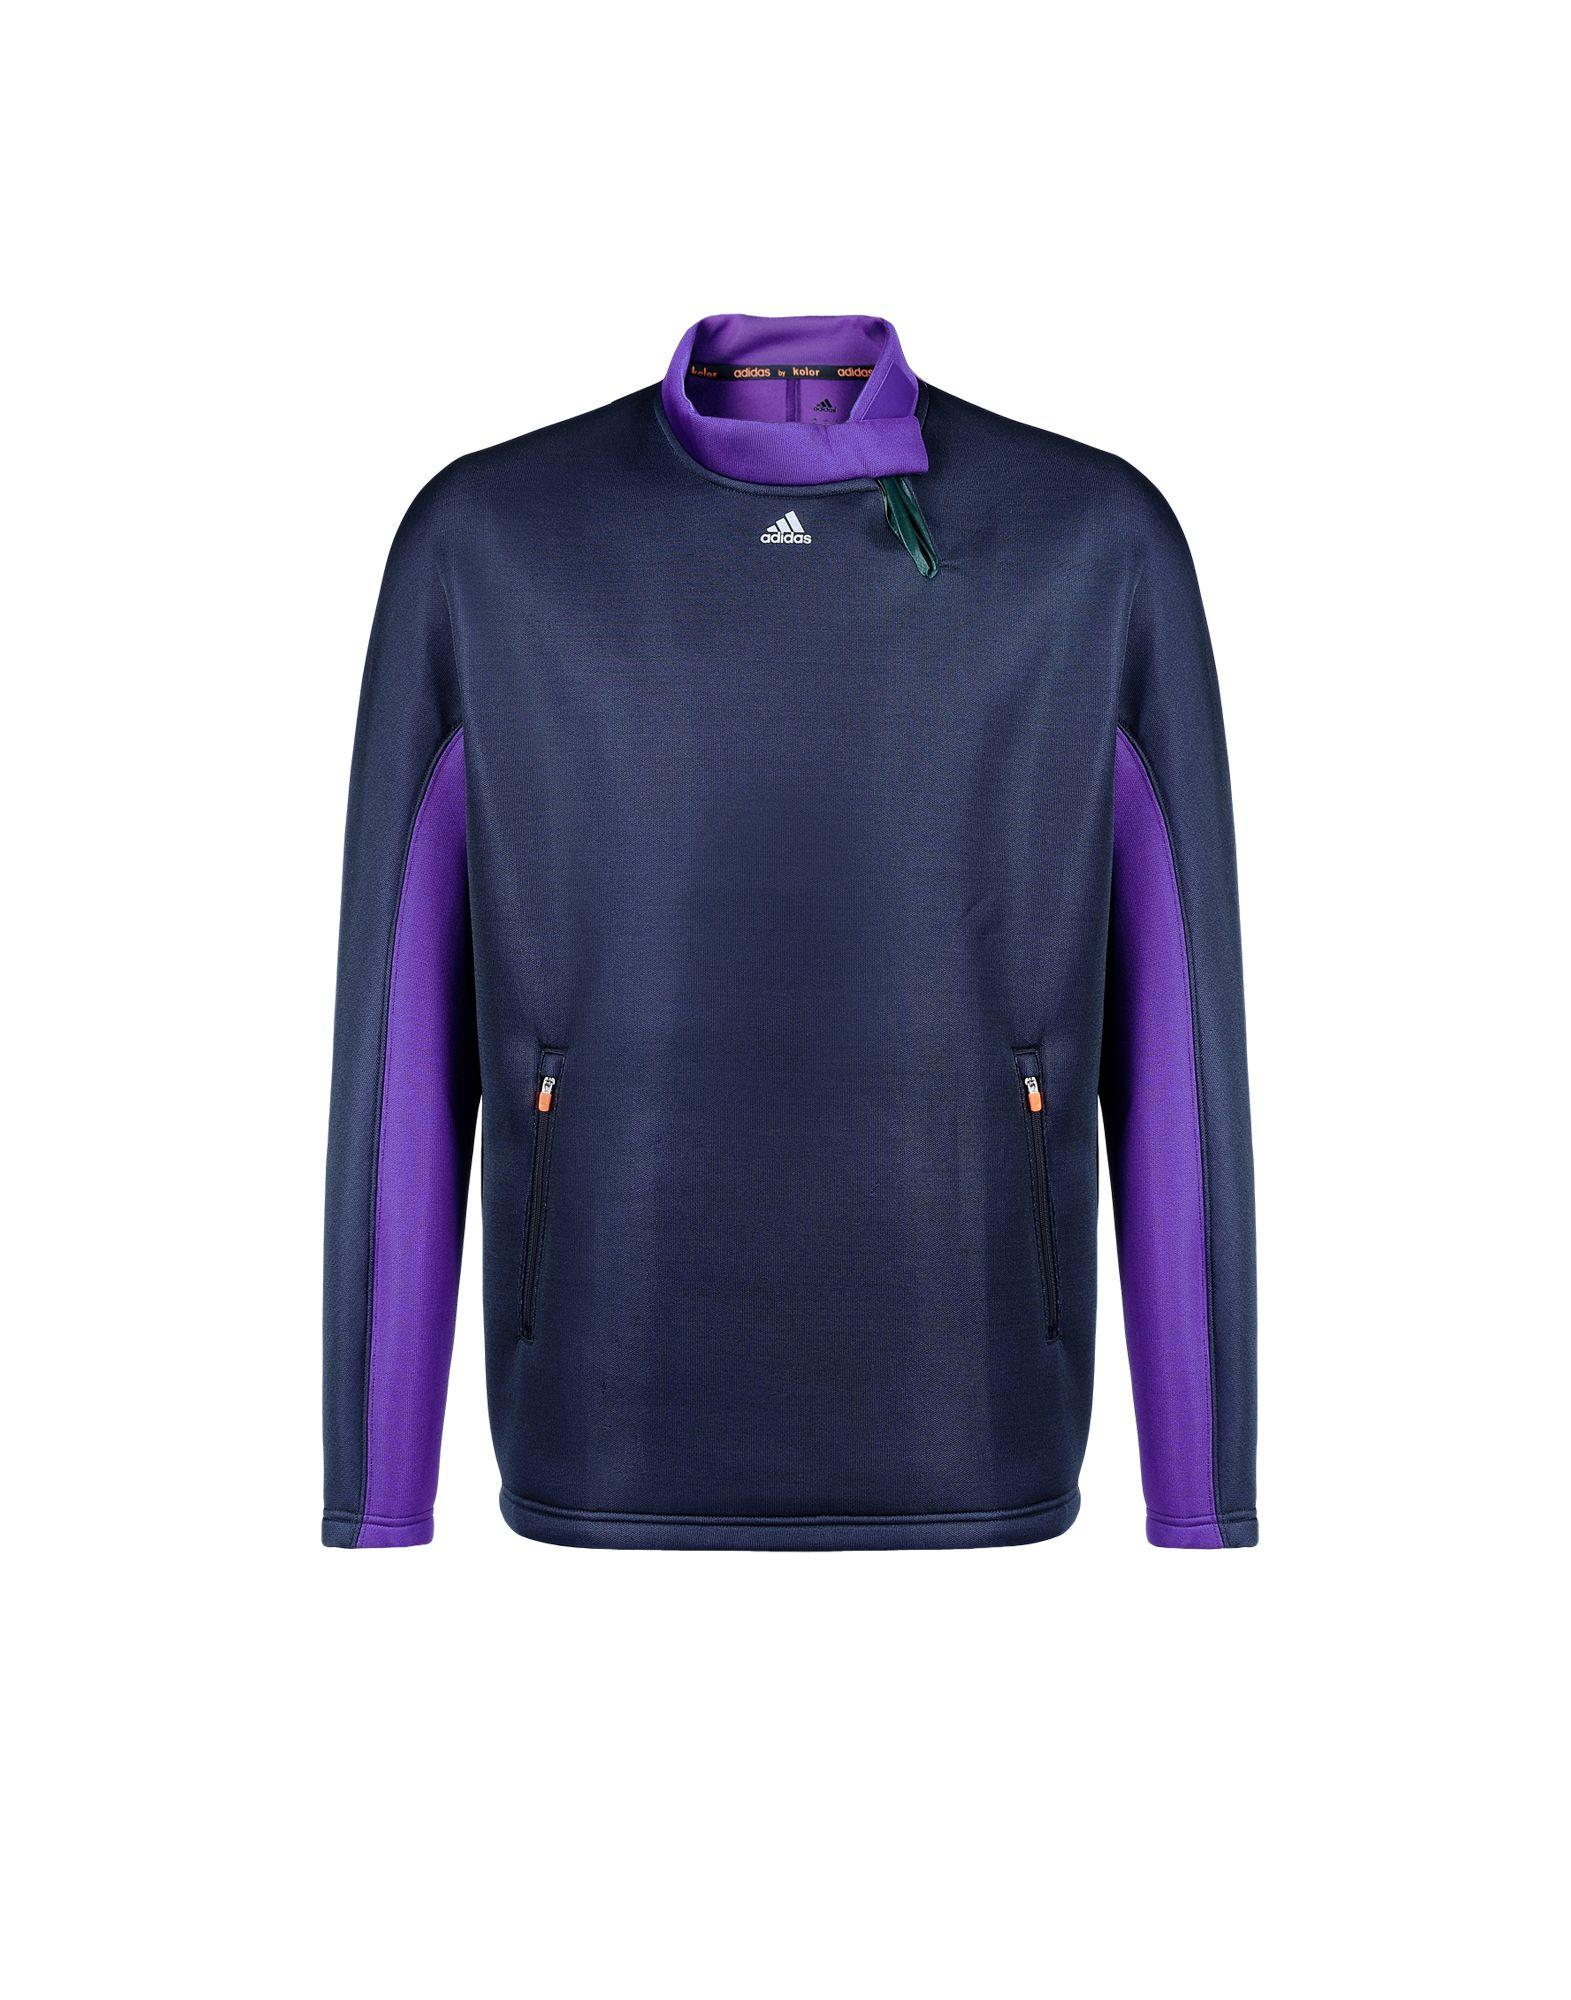 c0b382c9f09f1b ... KOLOR adidas by kolor 3D KNIT LS TOP Sweatshirt Man ...